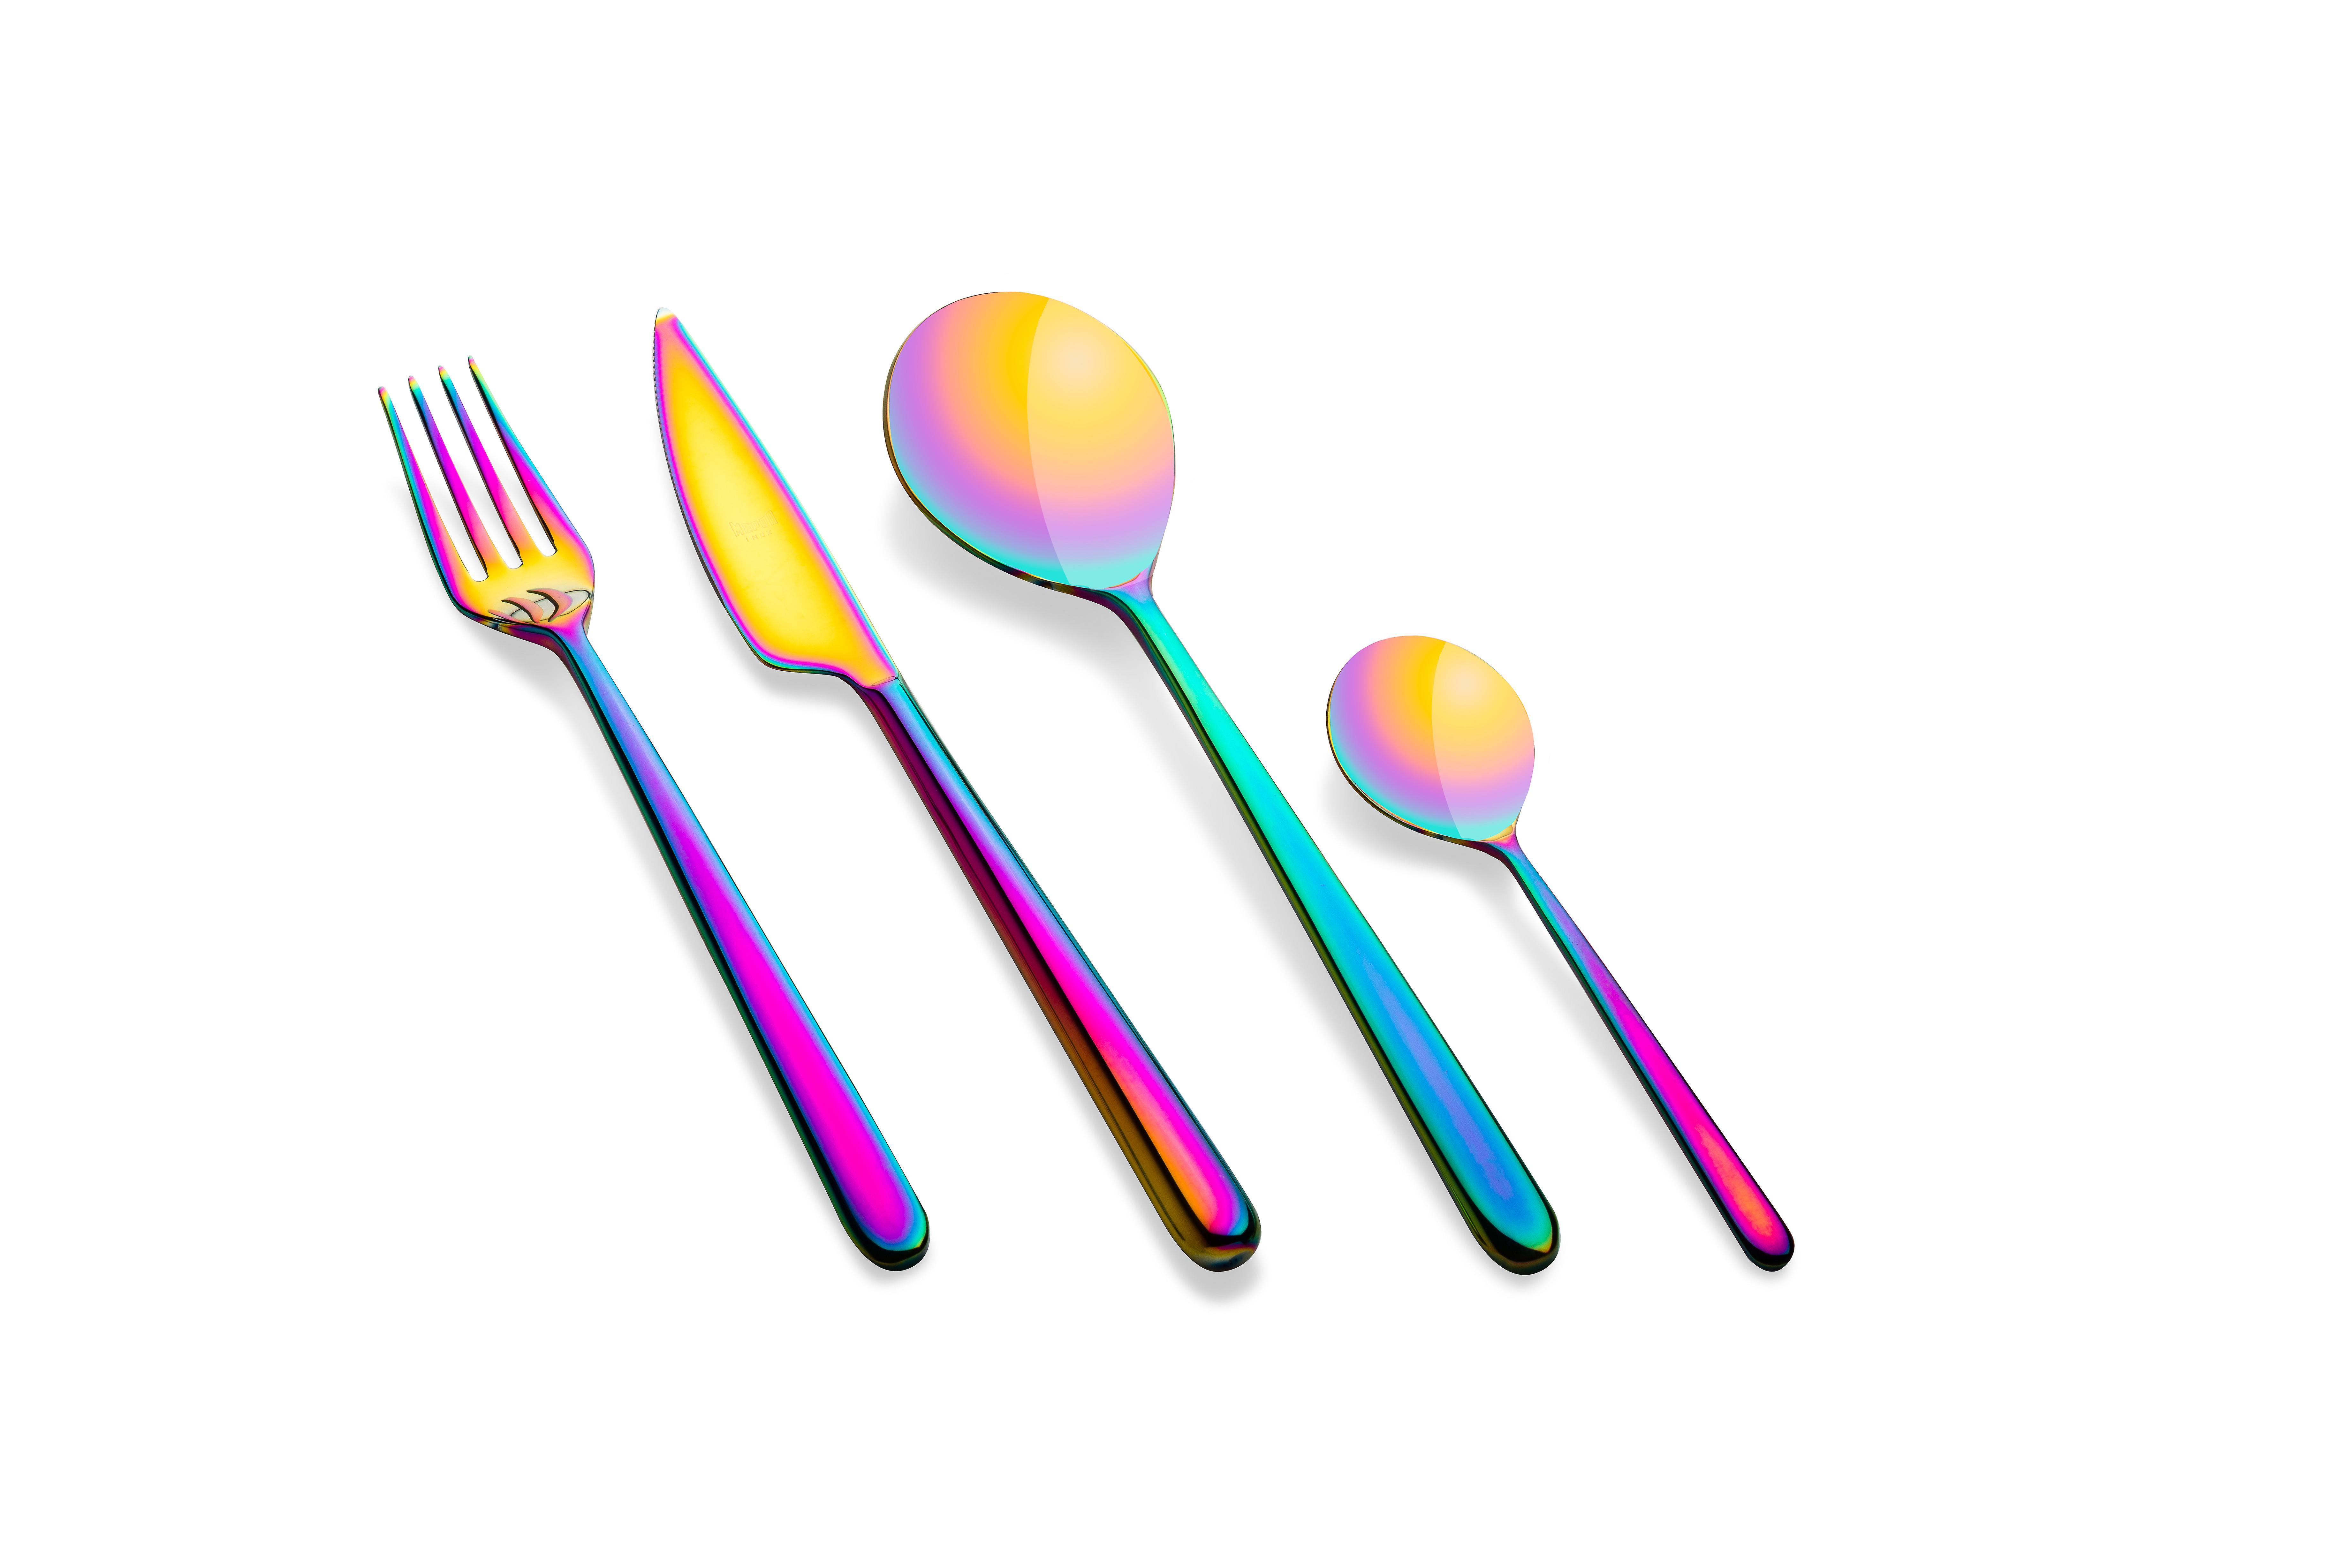 Mepra Linea Rainbow 24 pcs flatware set